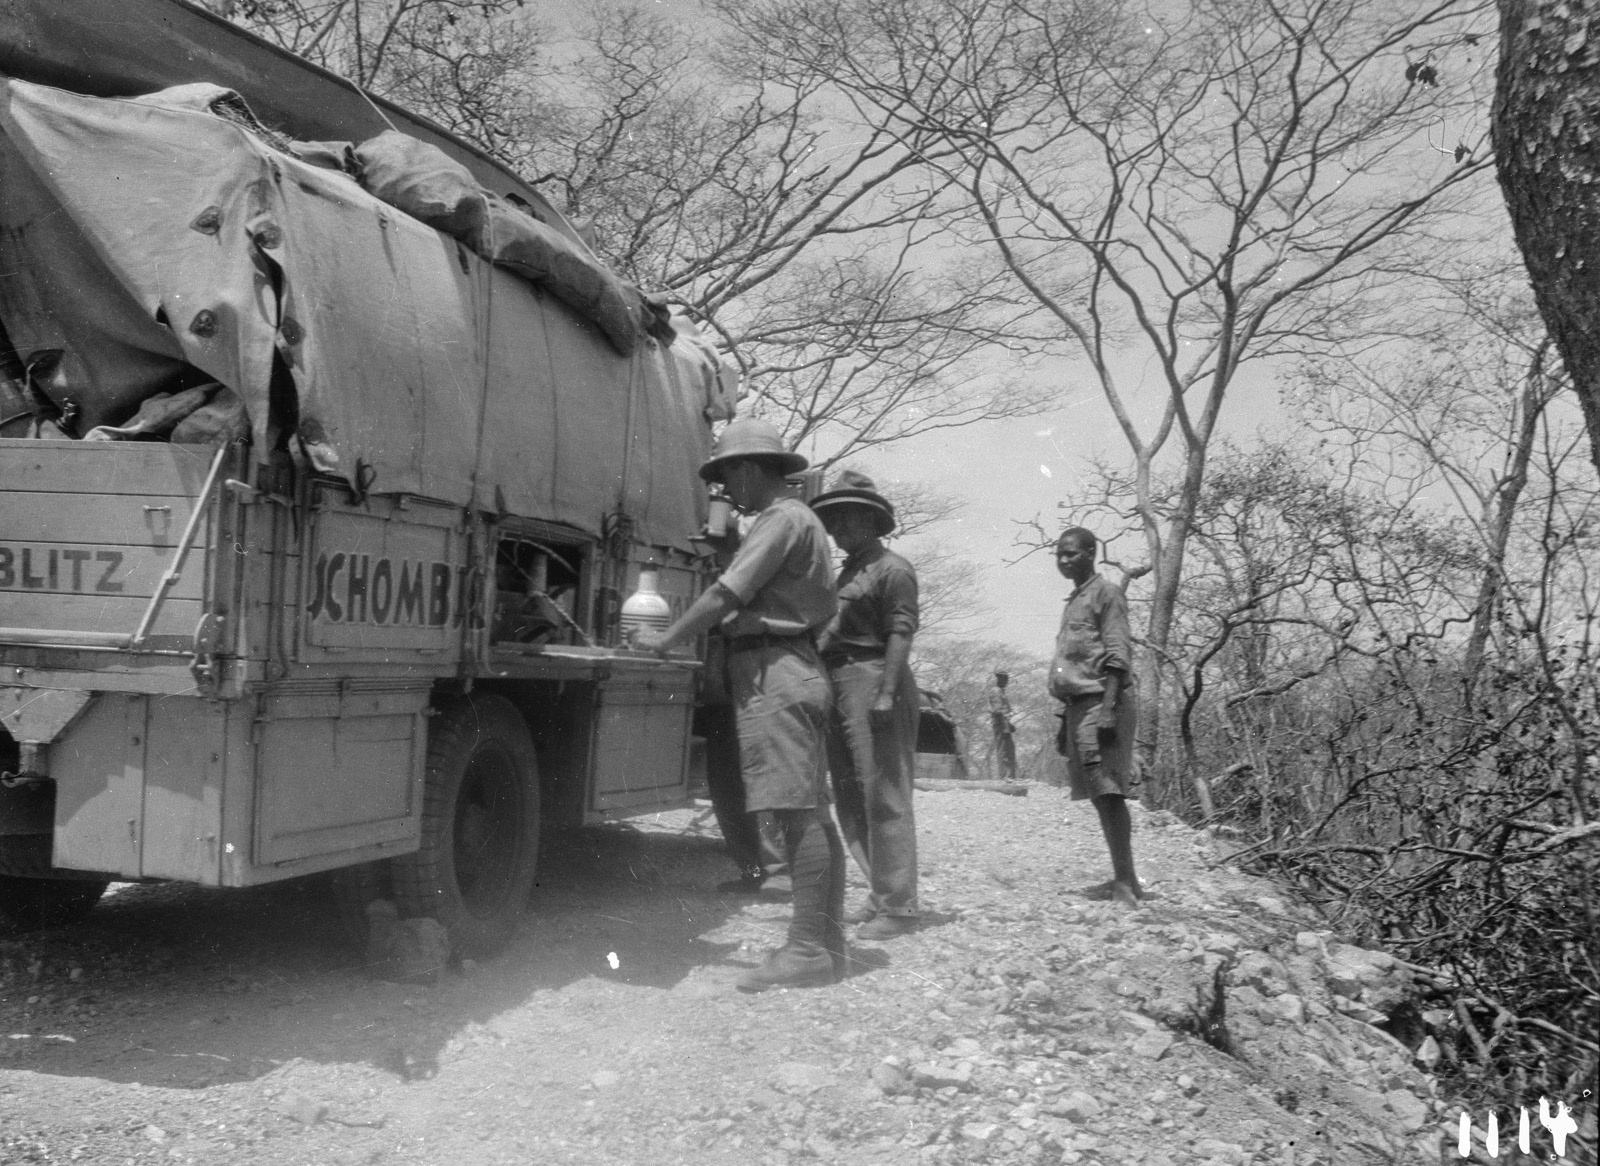 1114. Лундази. Участники экспедиции отдыхают возле грузовика